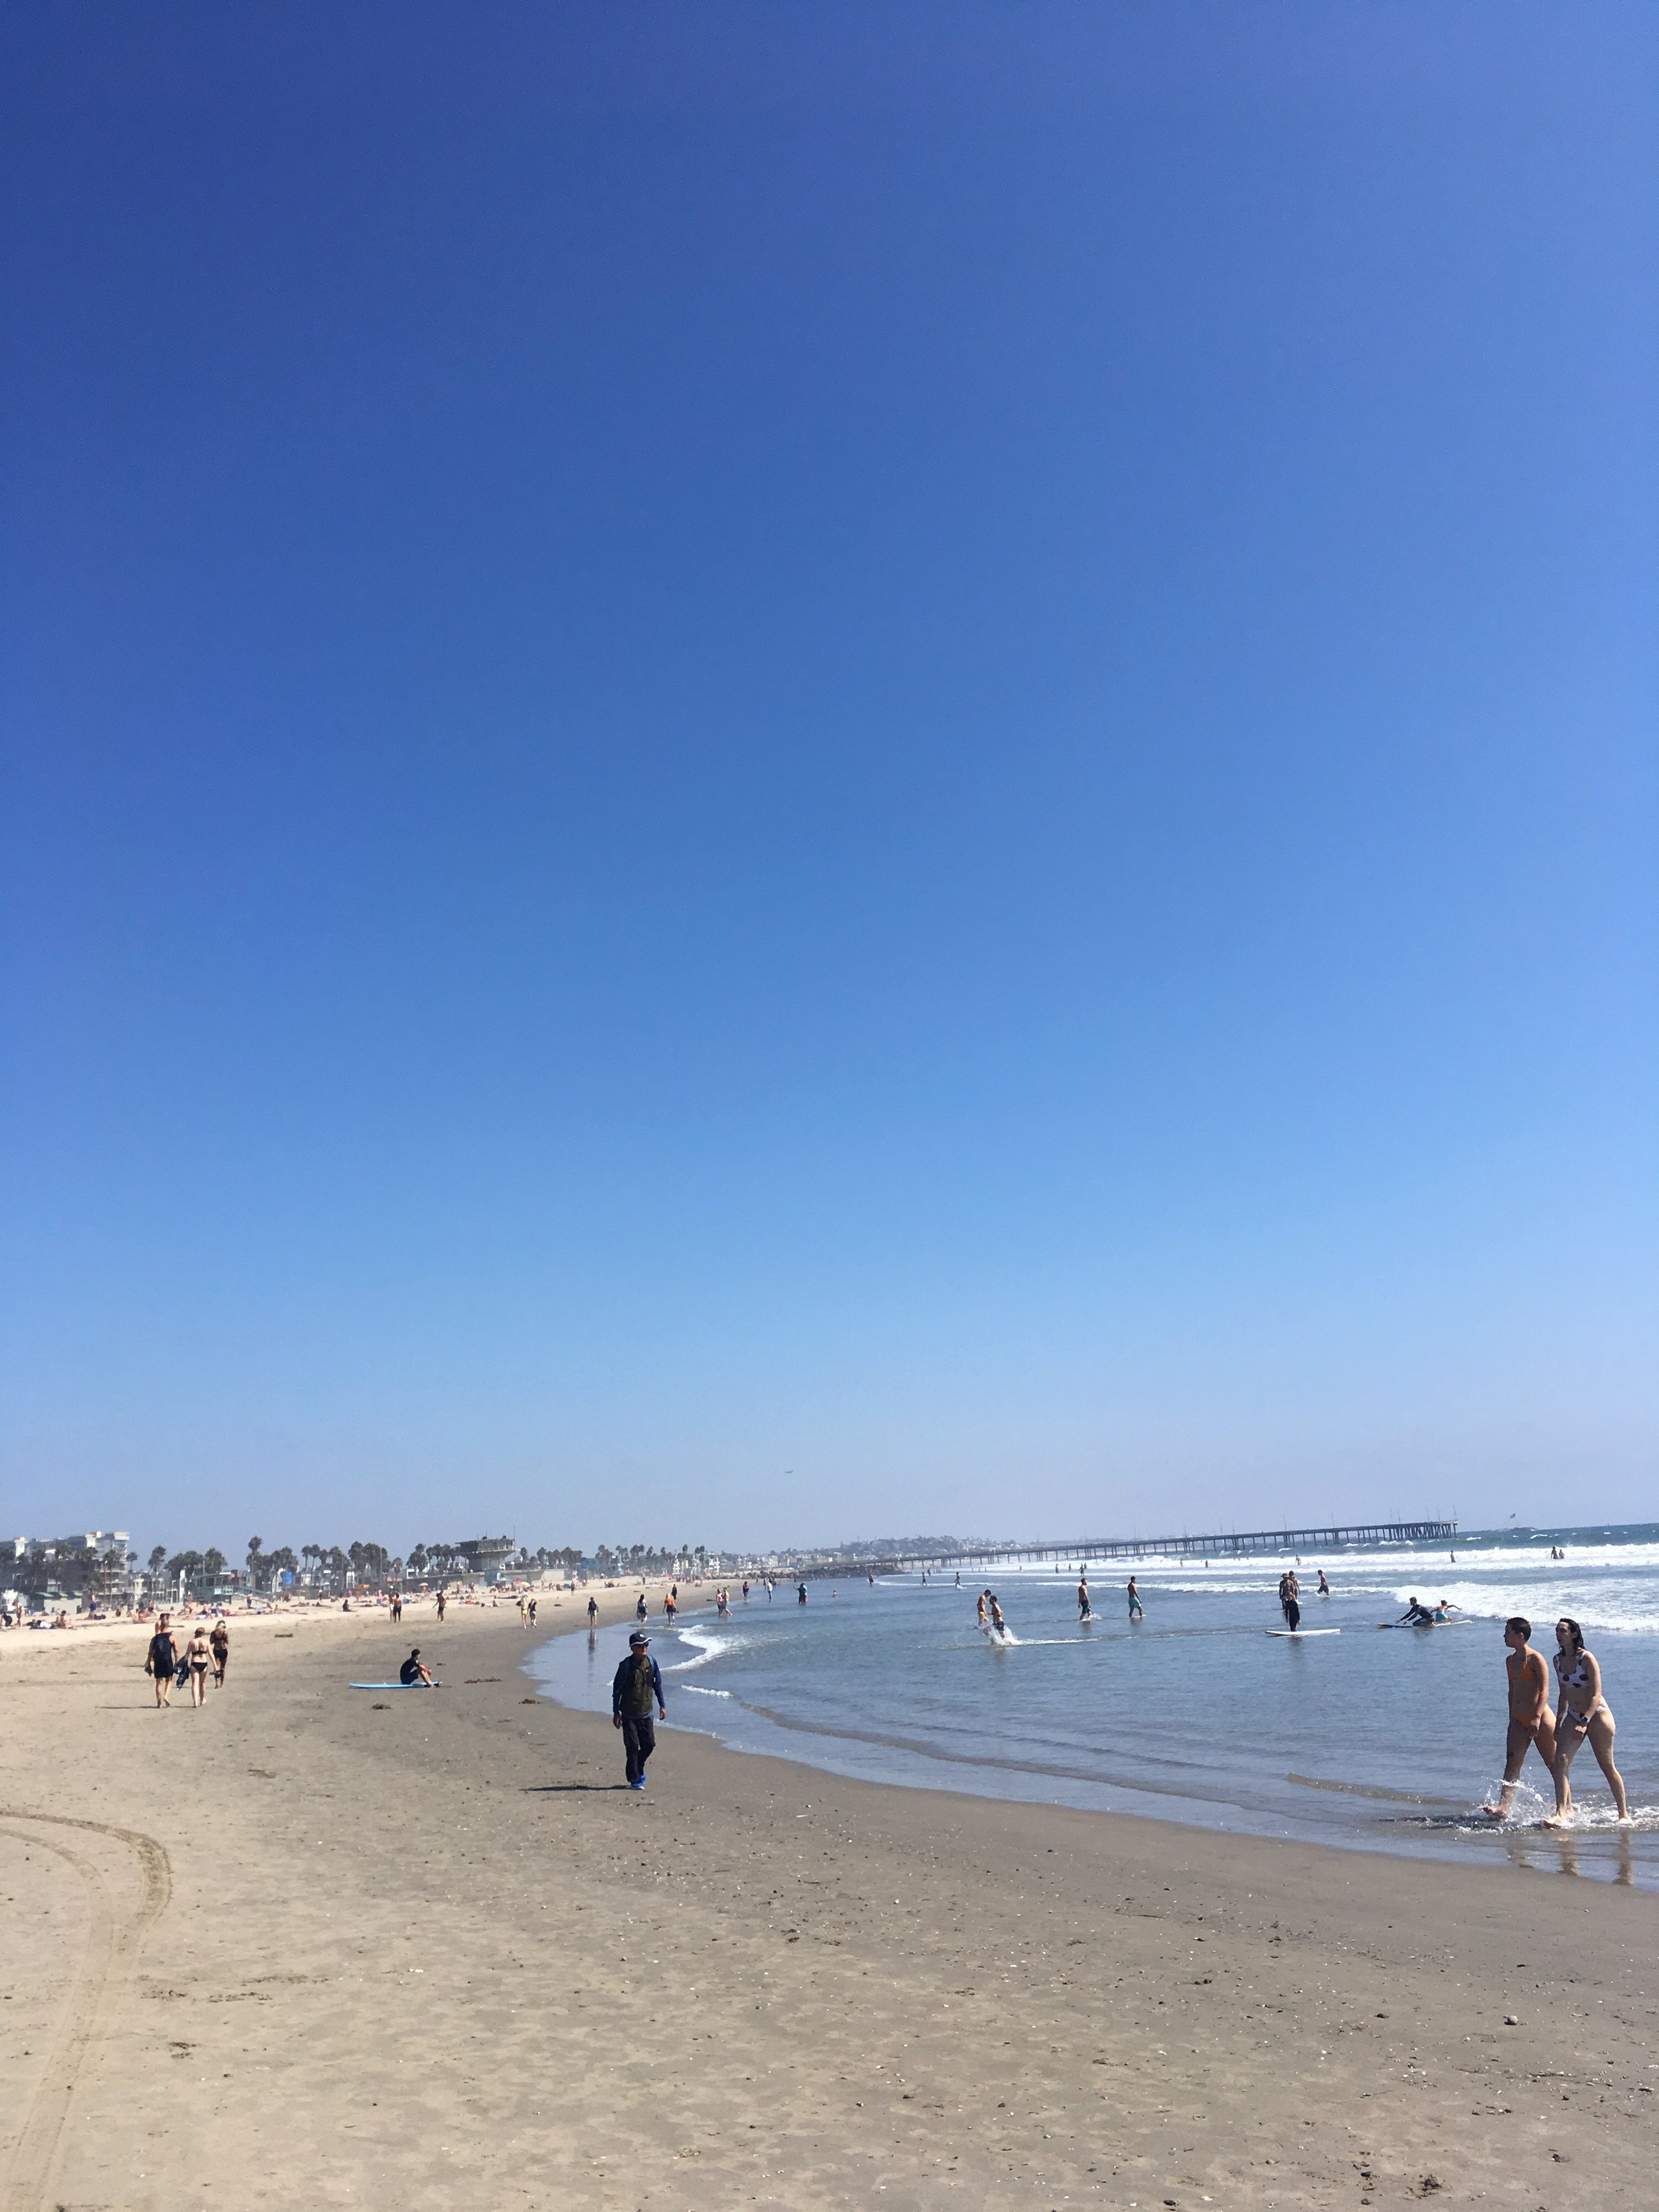 Margaret_Alba_Los_Angeles-8.jpg